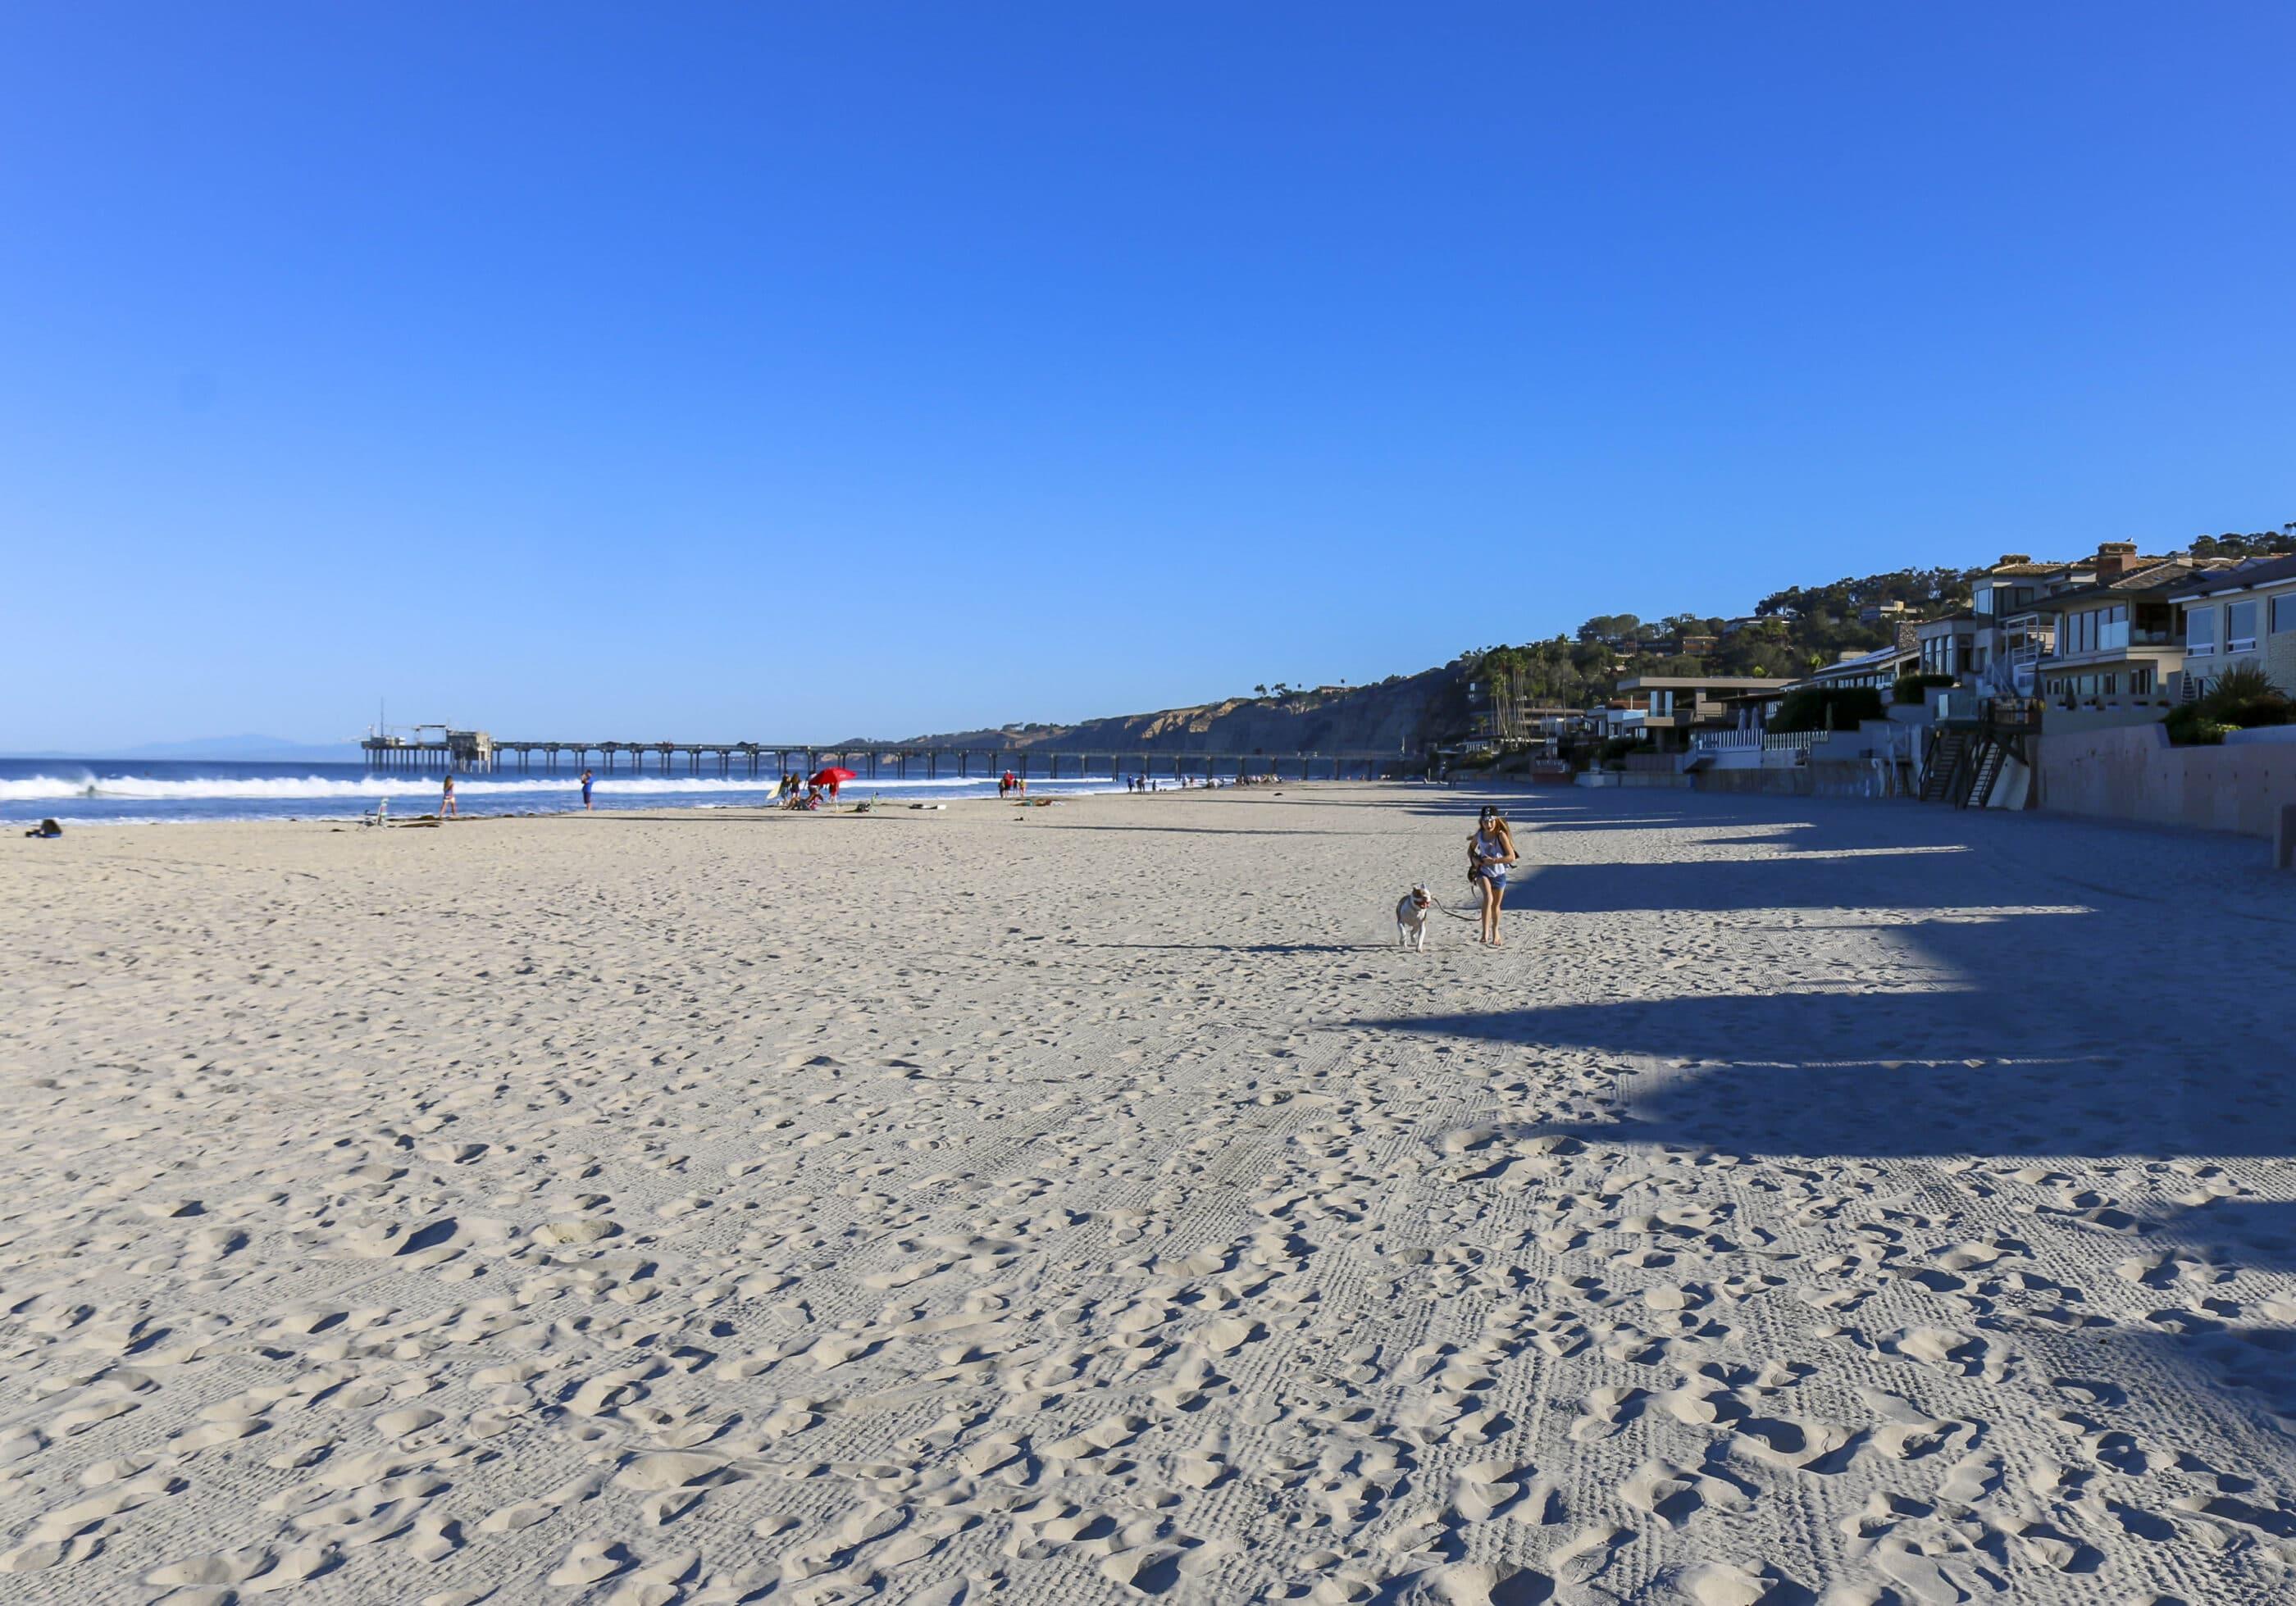 A morning dog walk on La Jolla Shores Beach.